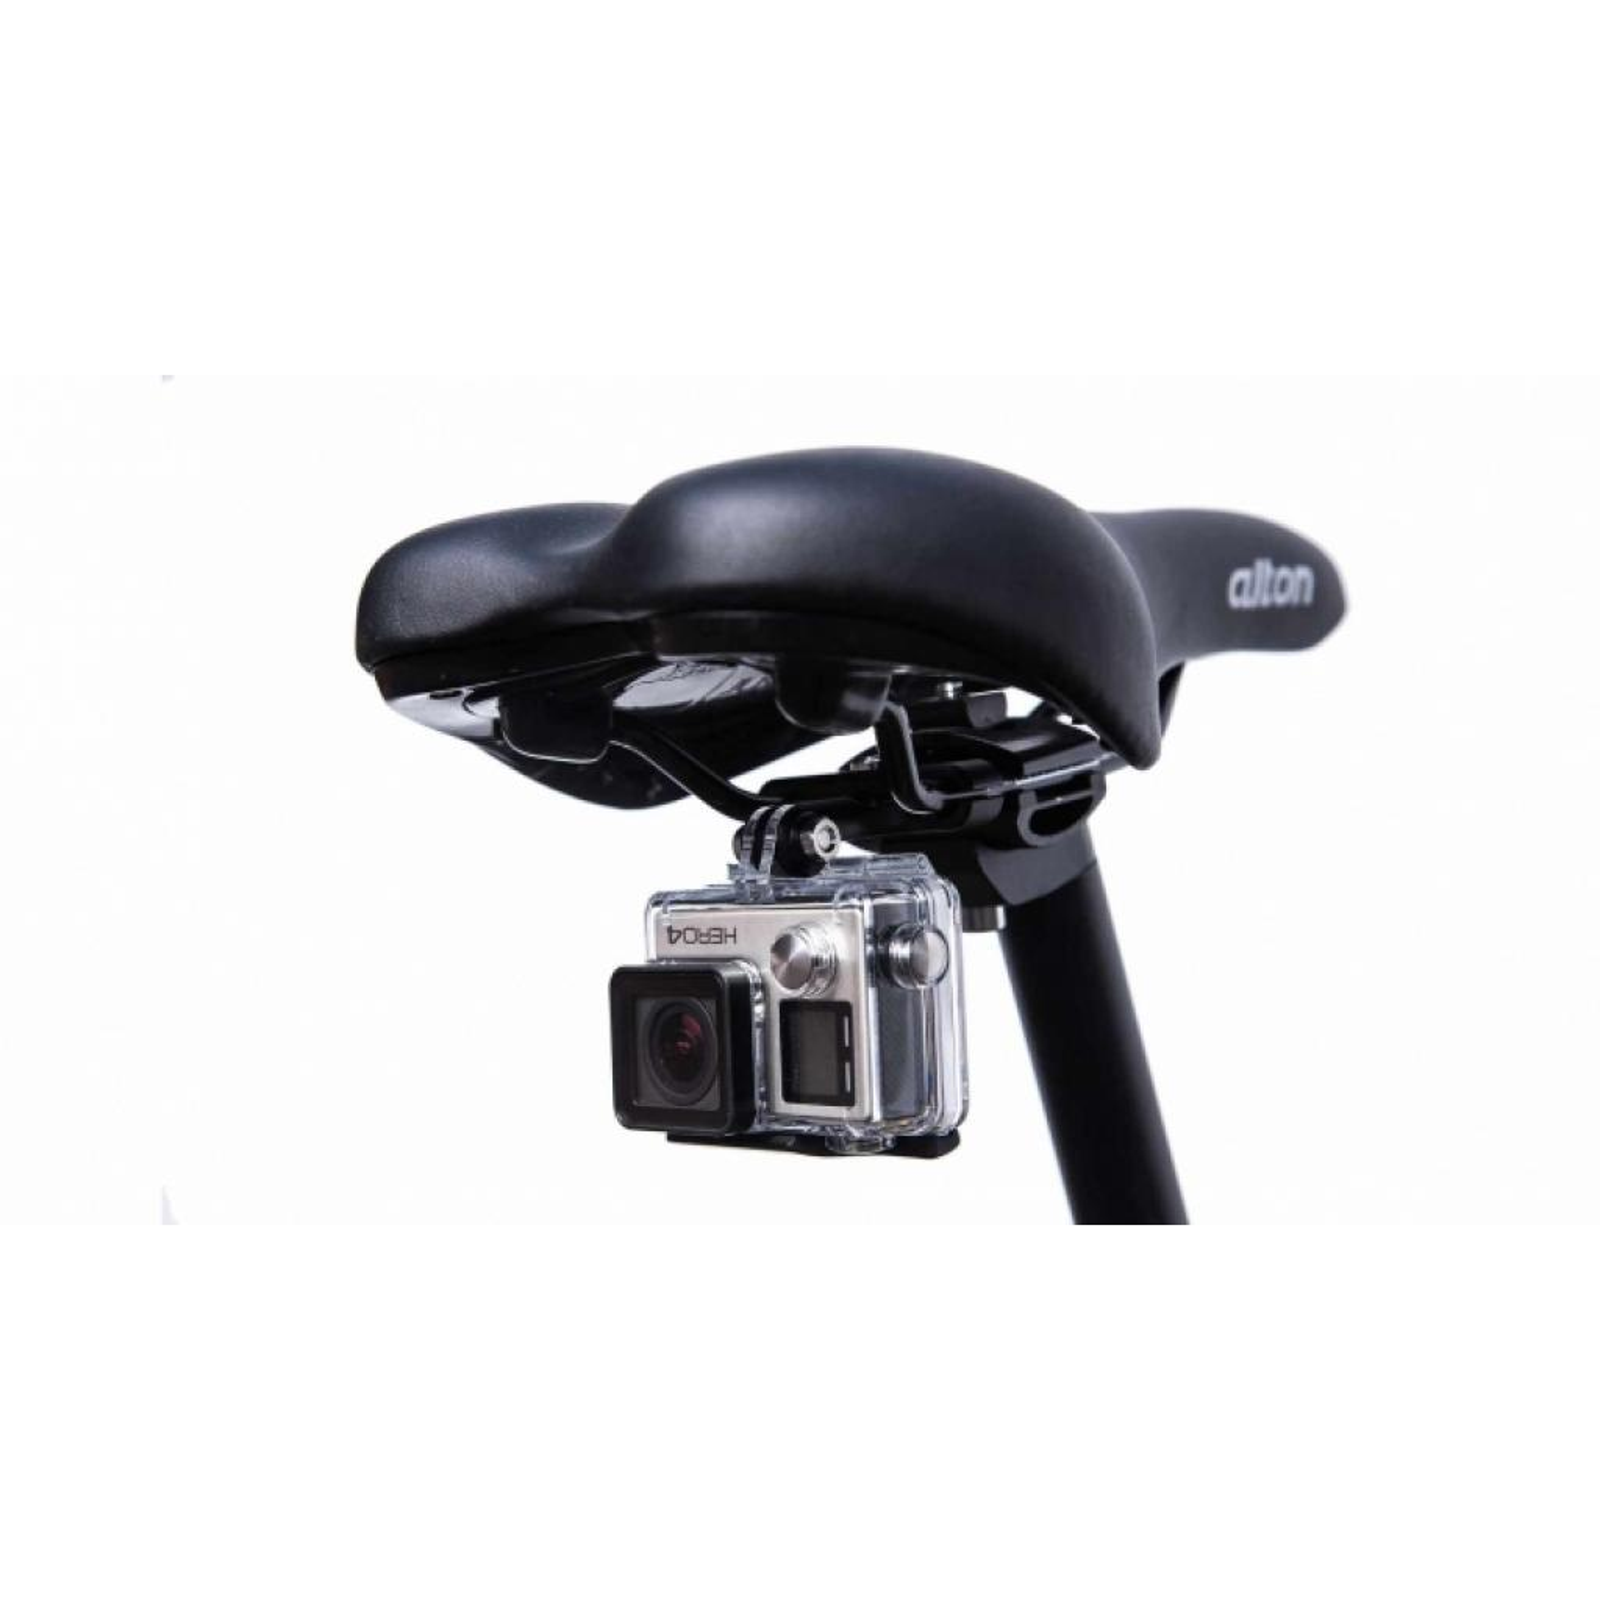 Аксессуар к экшн-камерам GoPro Pro Seat Rail Mount (AMBSM-001) изображение 4